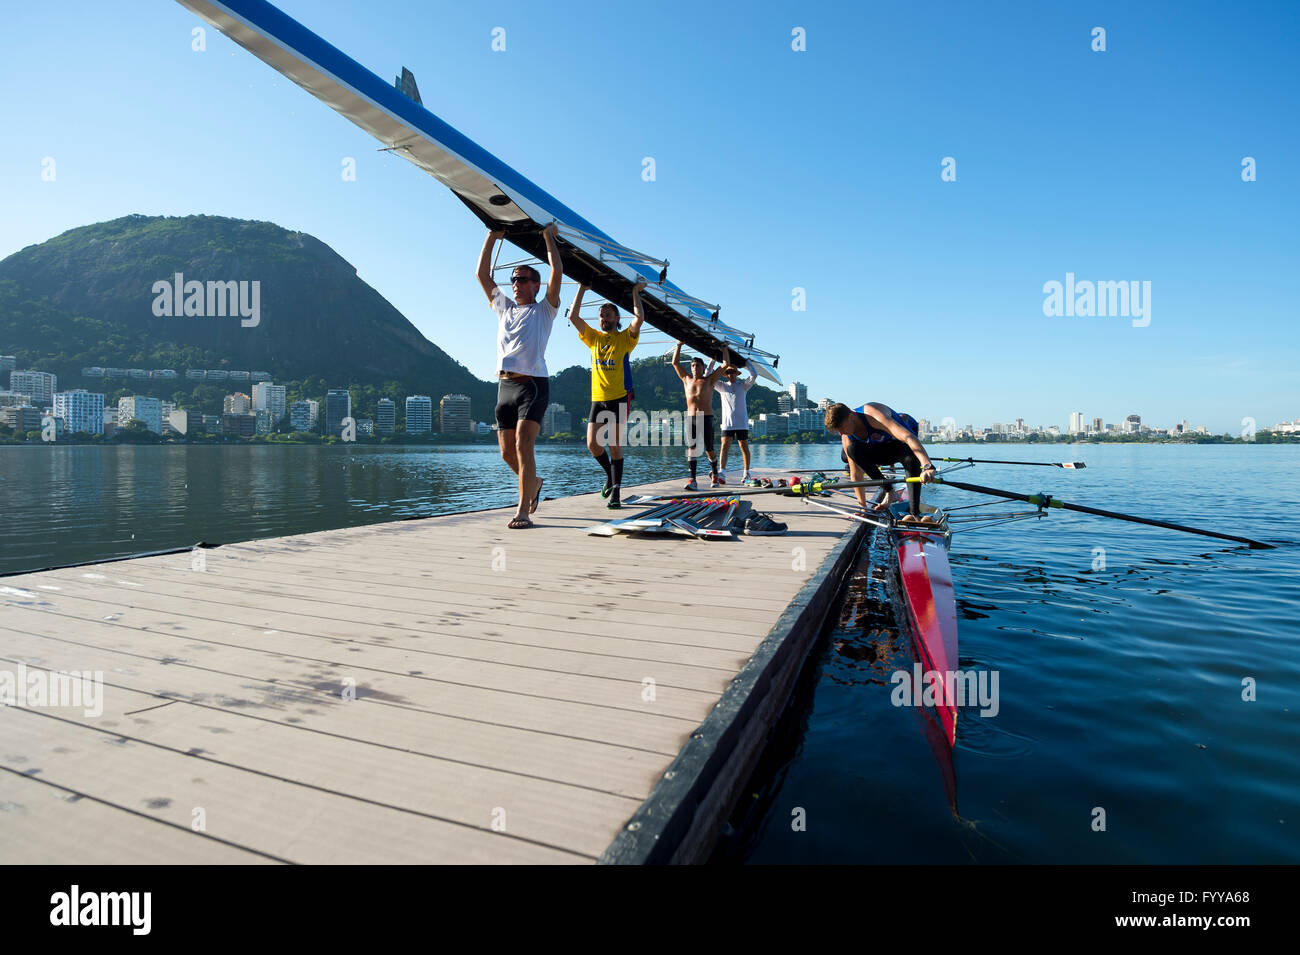 RIO DE JANEIRO - MARCH 22, 2016: Brazilian rowers carry their boat back to the clubhouse at Lagoa Rodrigo de Freitas - Stock Image